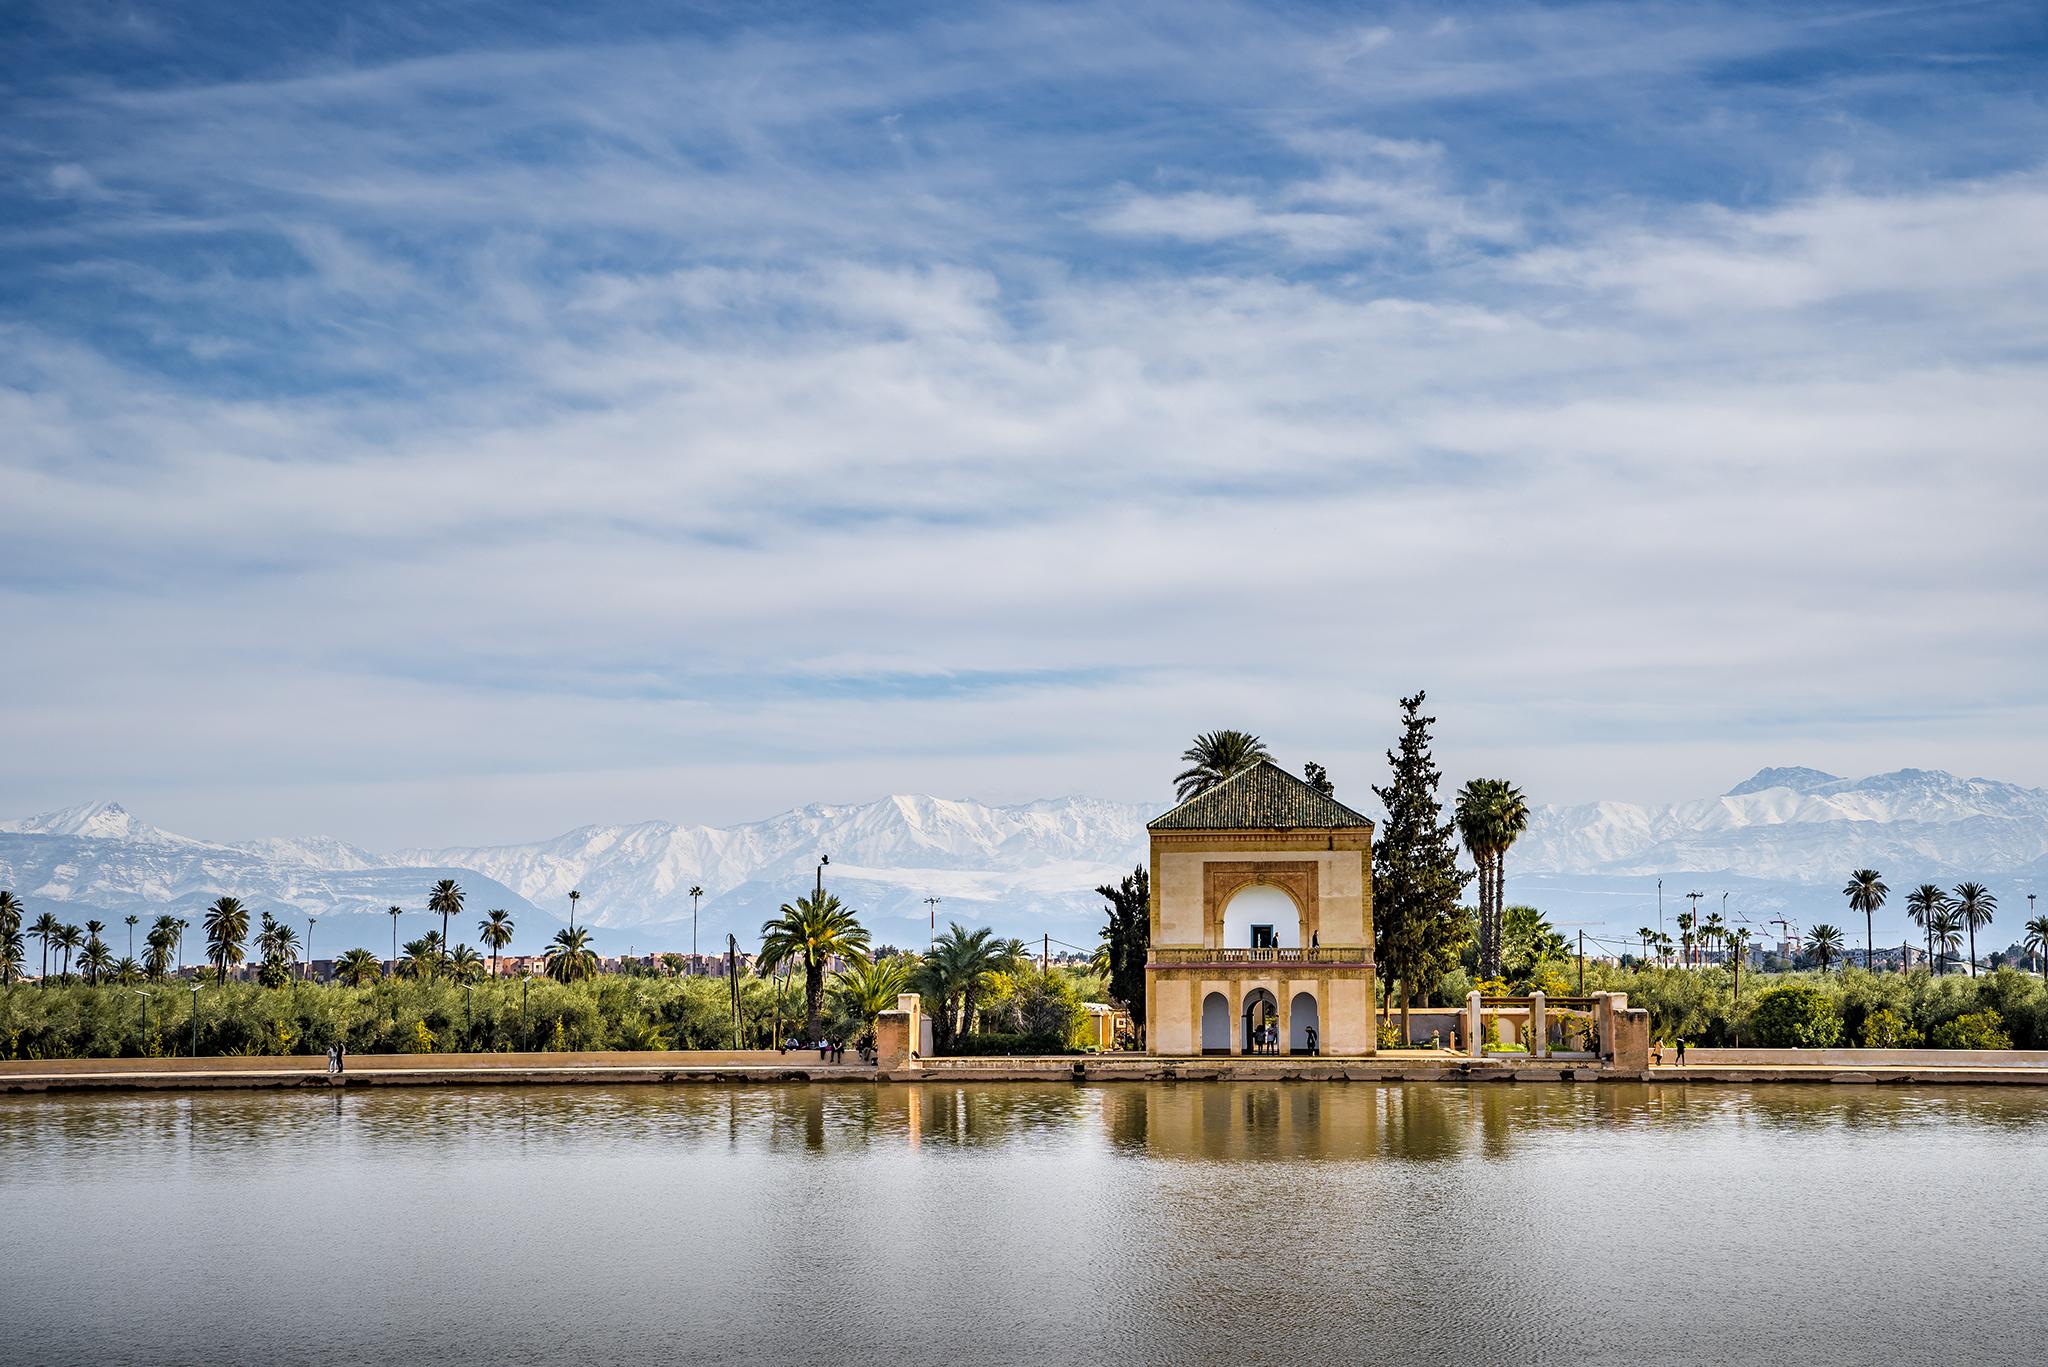 The Menara gardens, Morocco